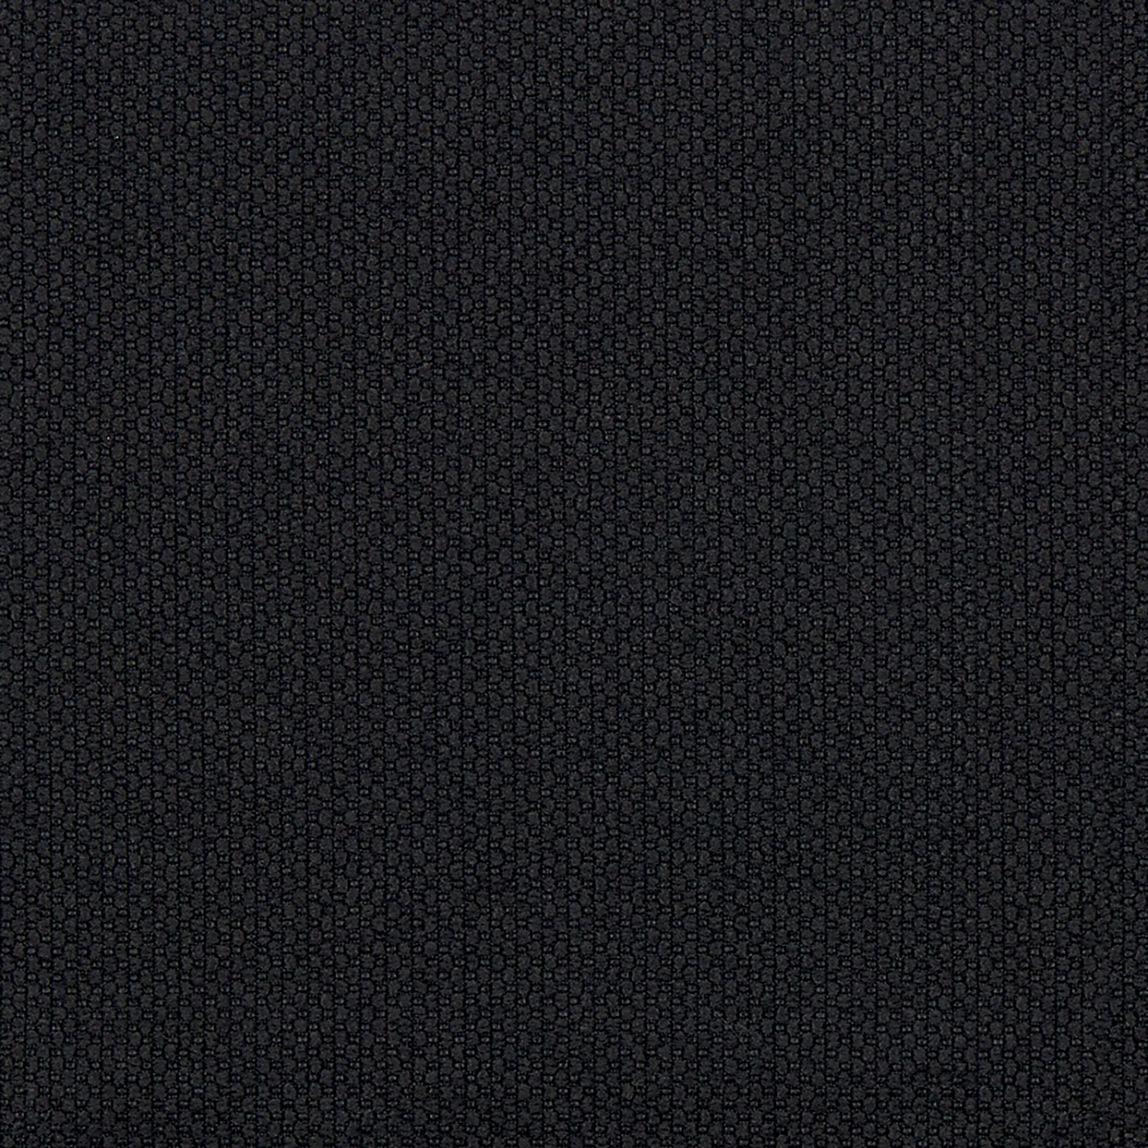 Merit Blackout Swatch